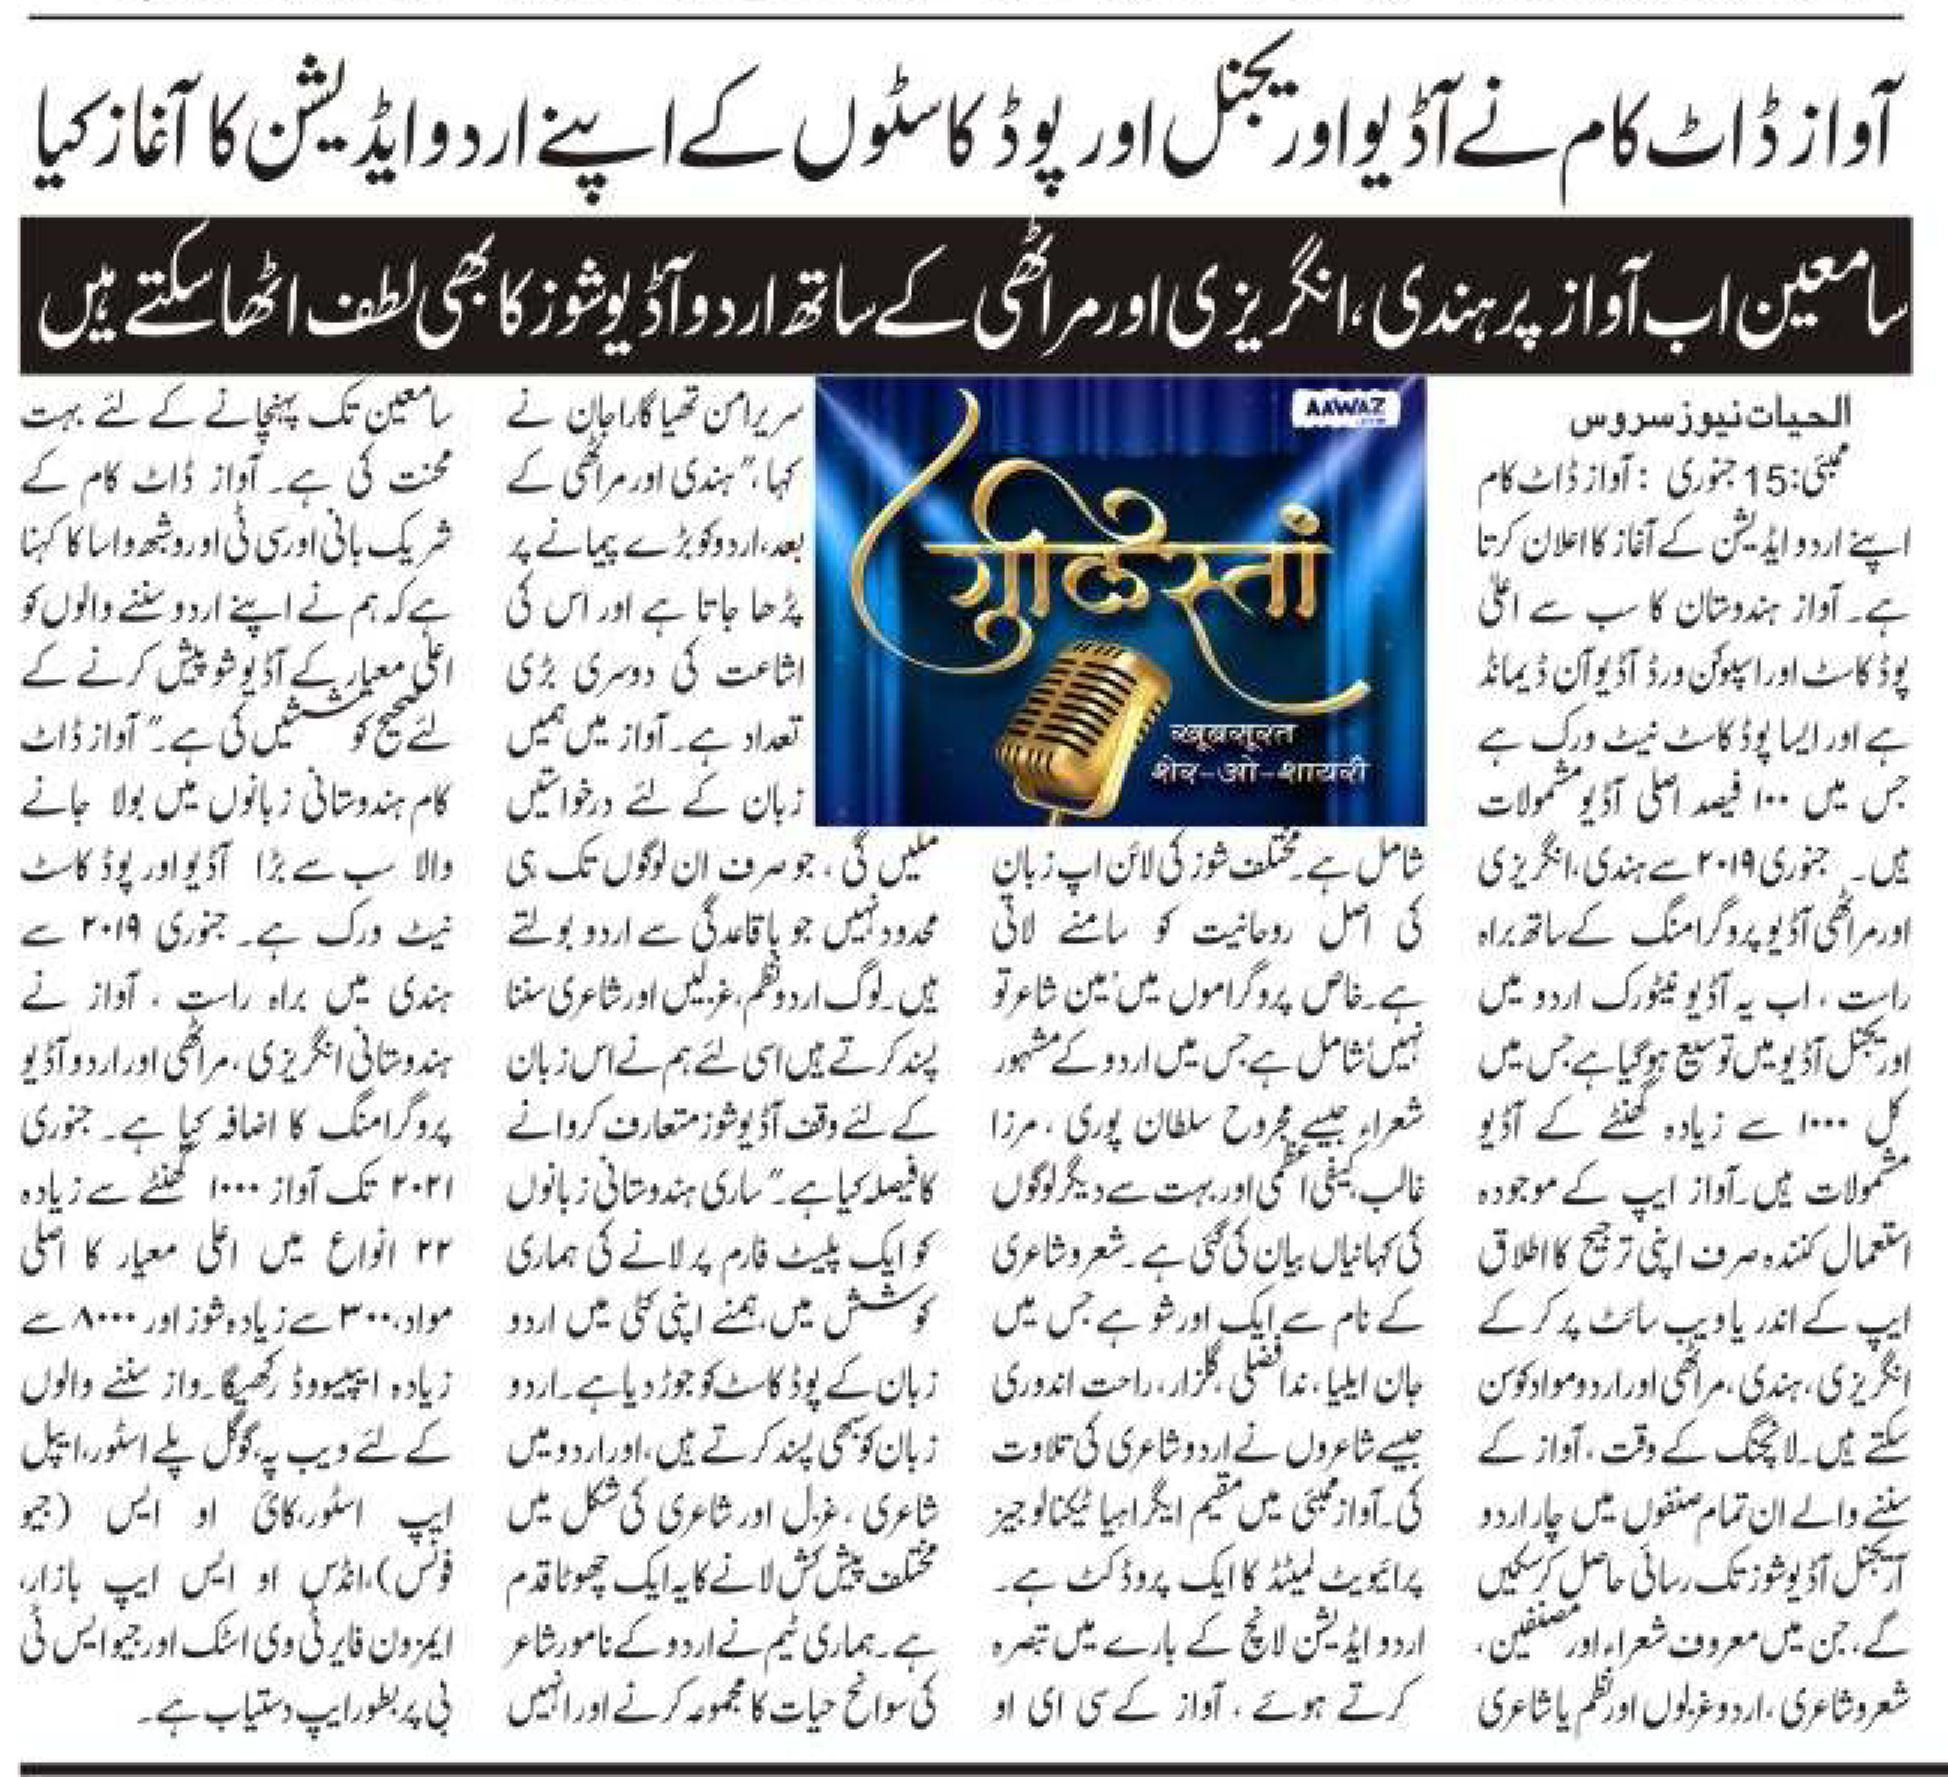 Daily Hindustan Express, 19th January, 2019